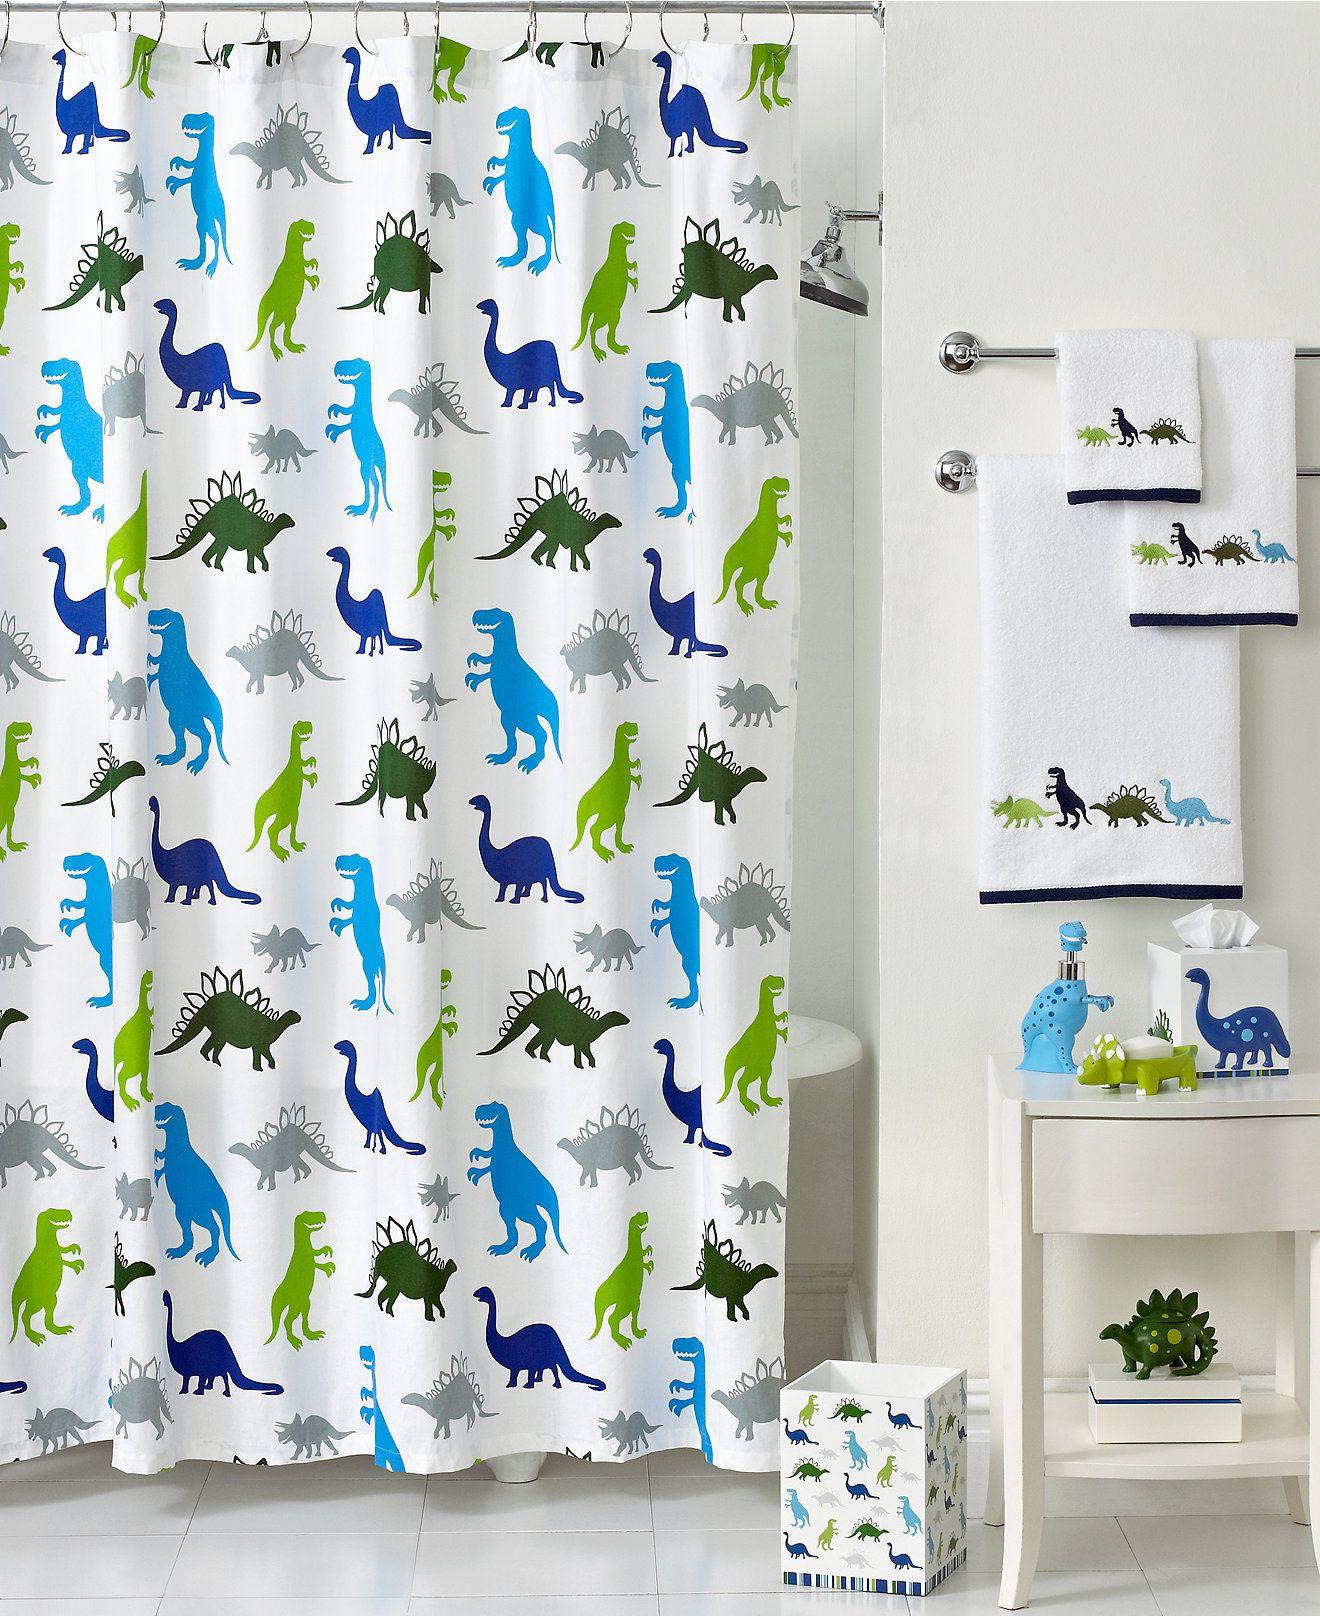 Kids Bathroom Set  Kid's Bathroom Sets for Kid friendly Bathroom Design